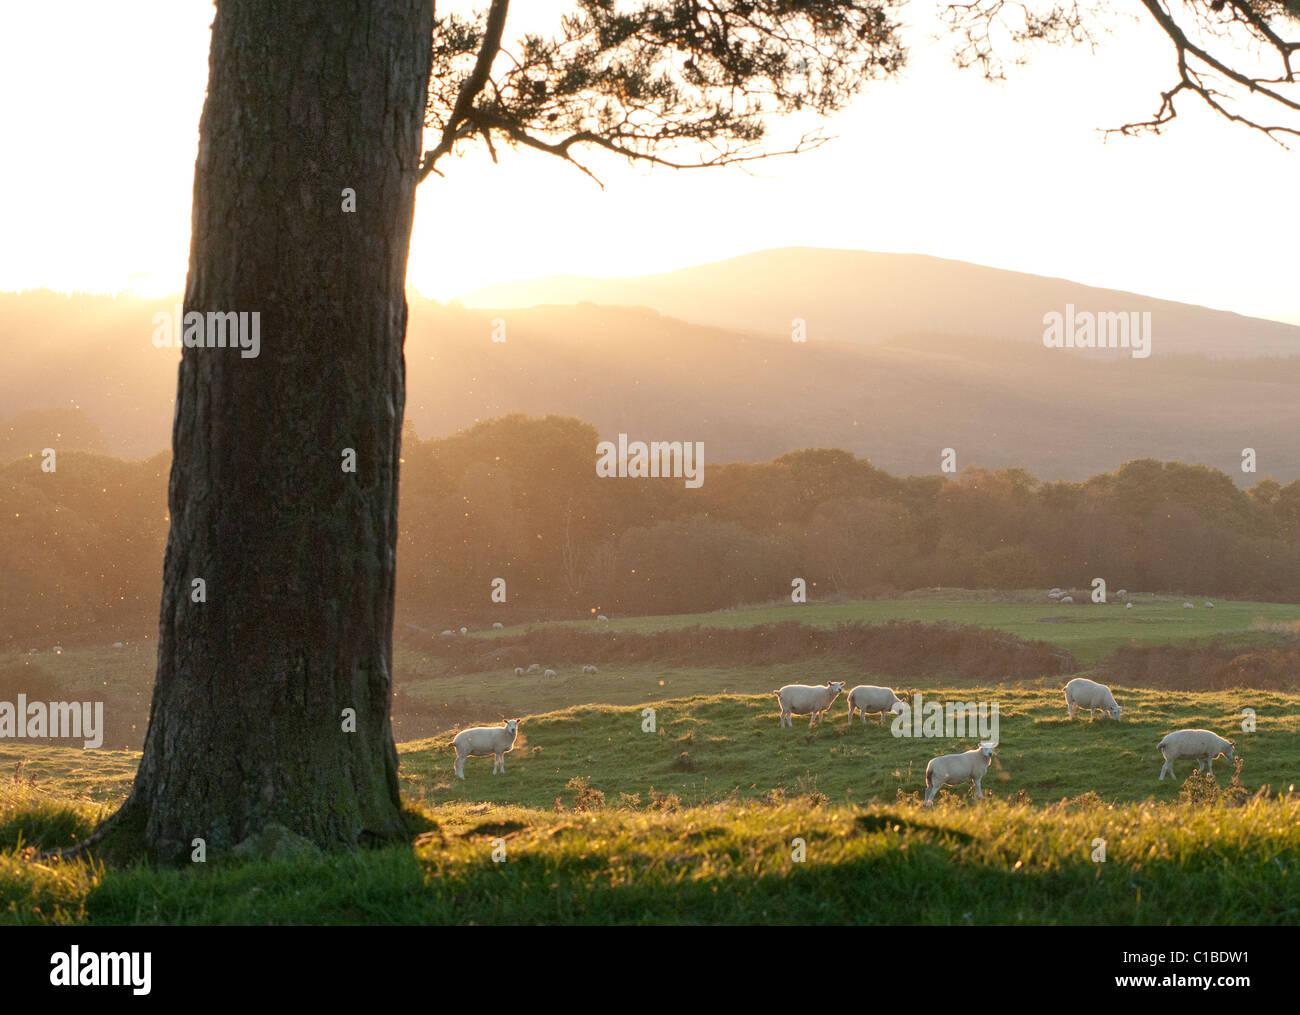 Tree trunk and sheep at sundown - Stock Image